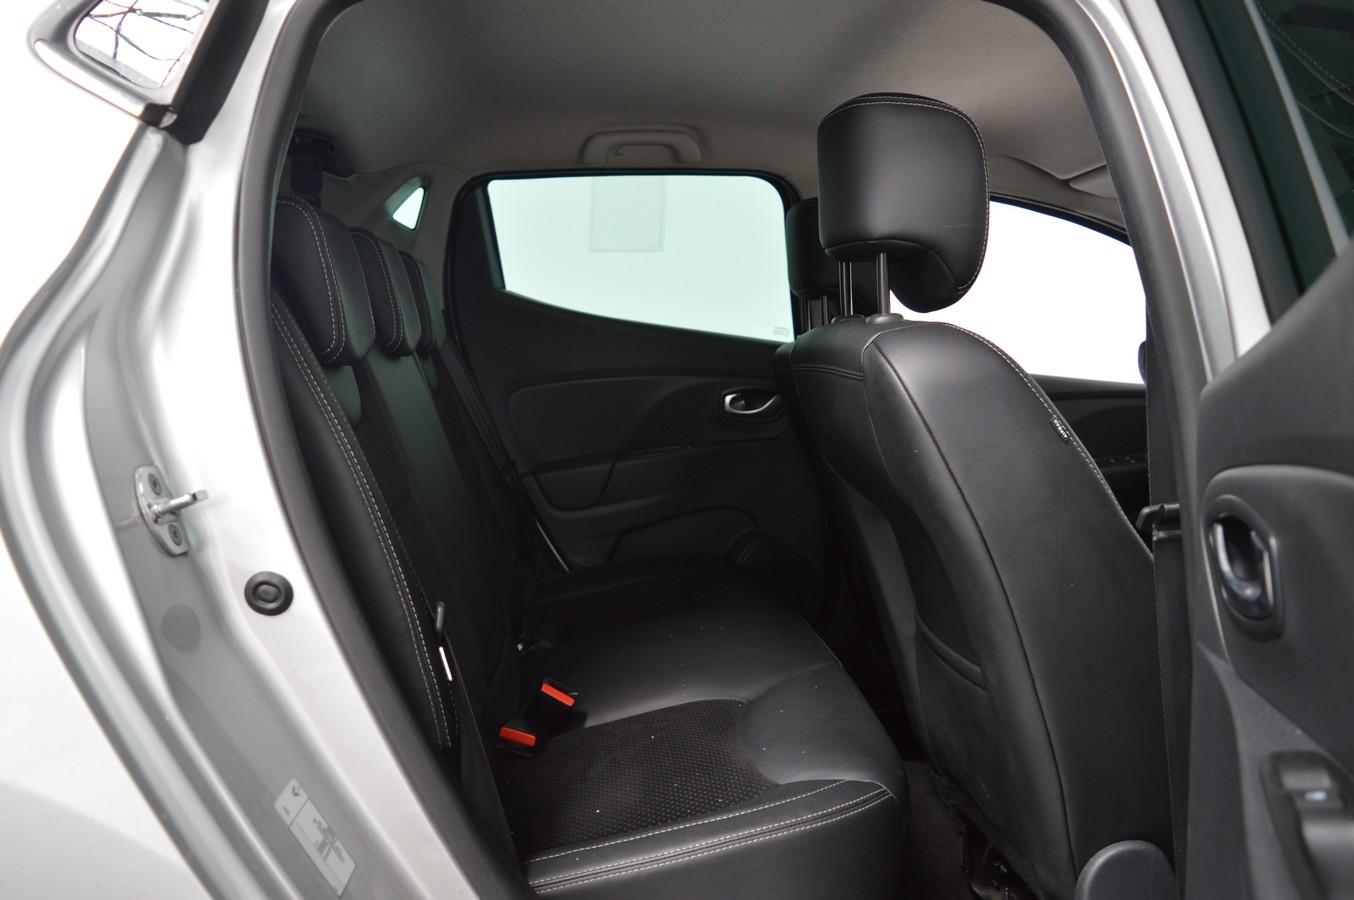 RENAULT CLIO IV 2018 à 10800 € - Photo n°6